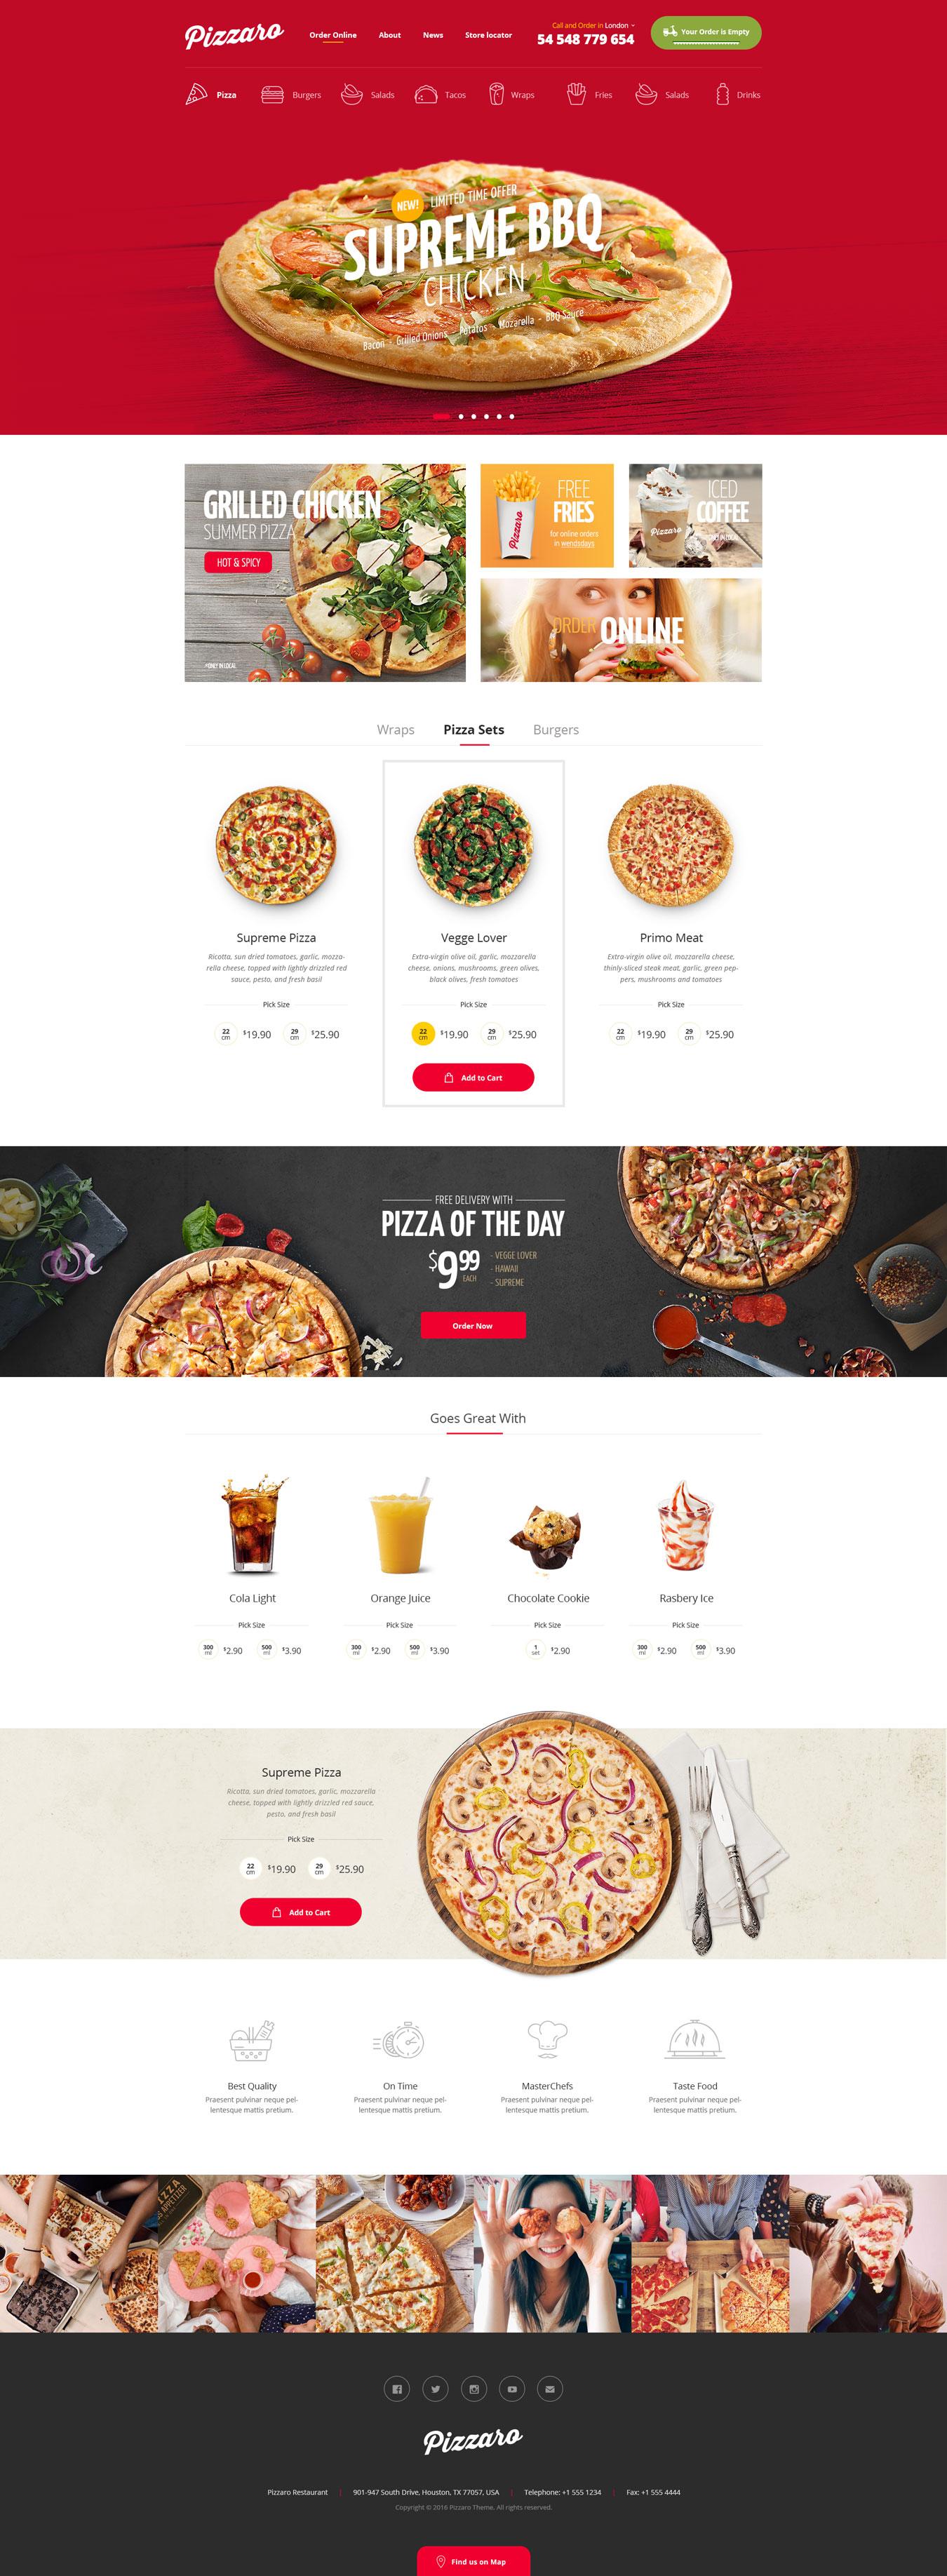 Pizzaro Fast Food & Restaurant Woo merce Theme by MadrasThemes